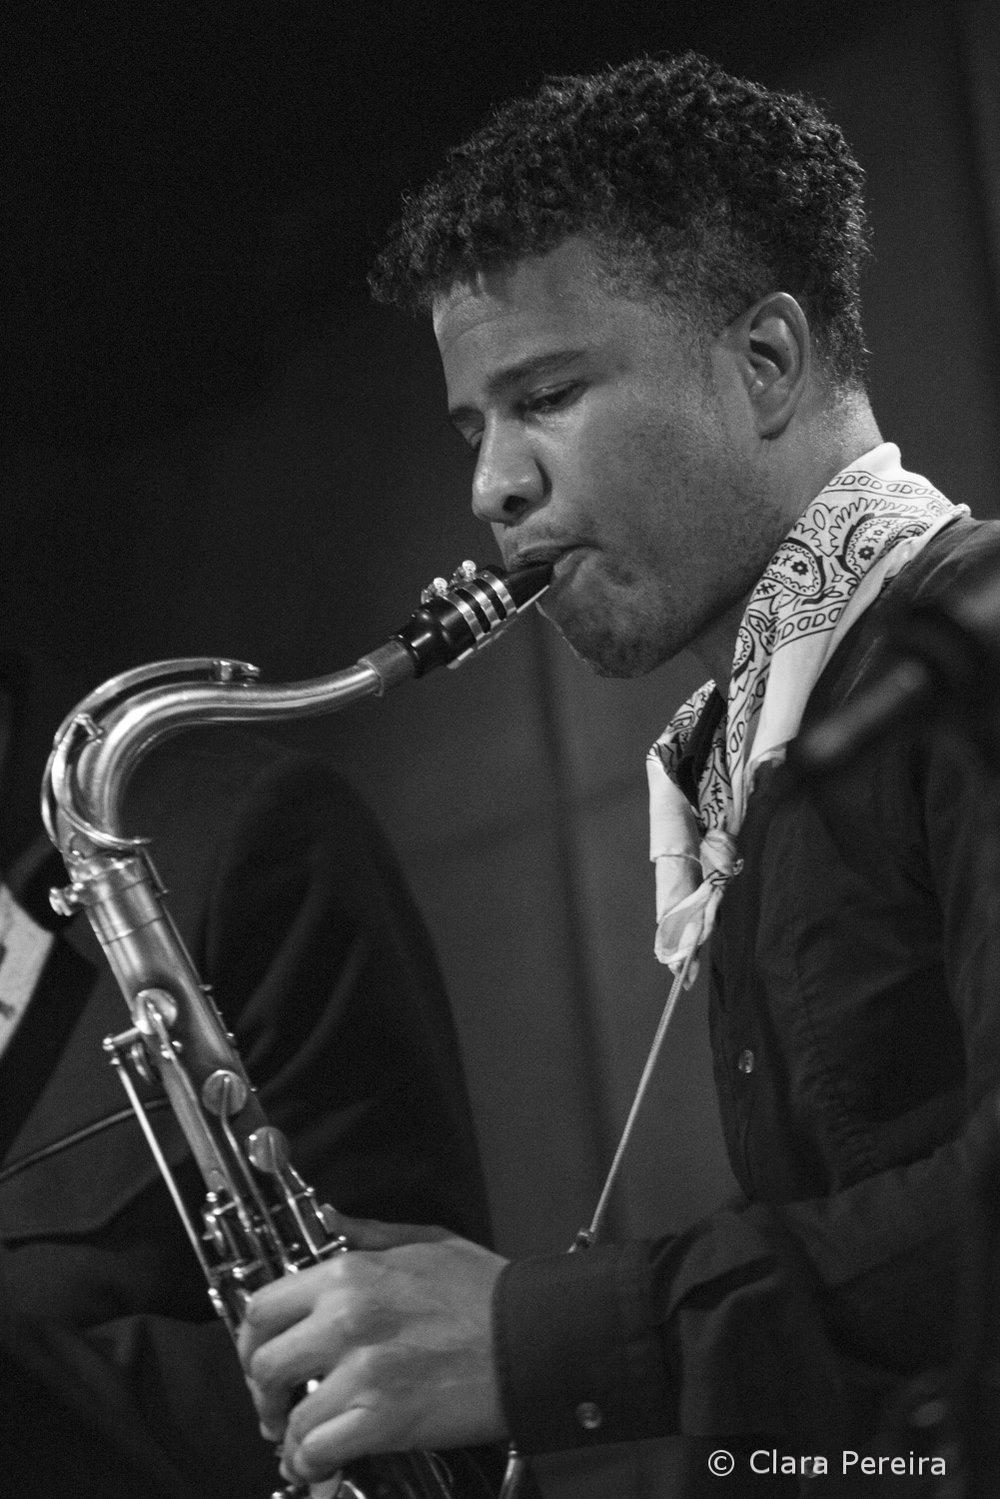 David Sanchez, 2018